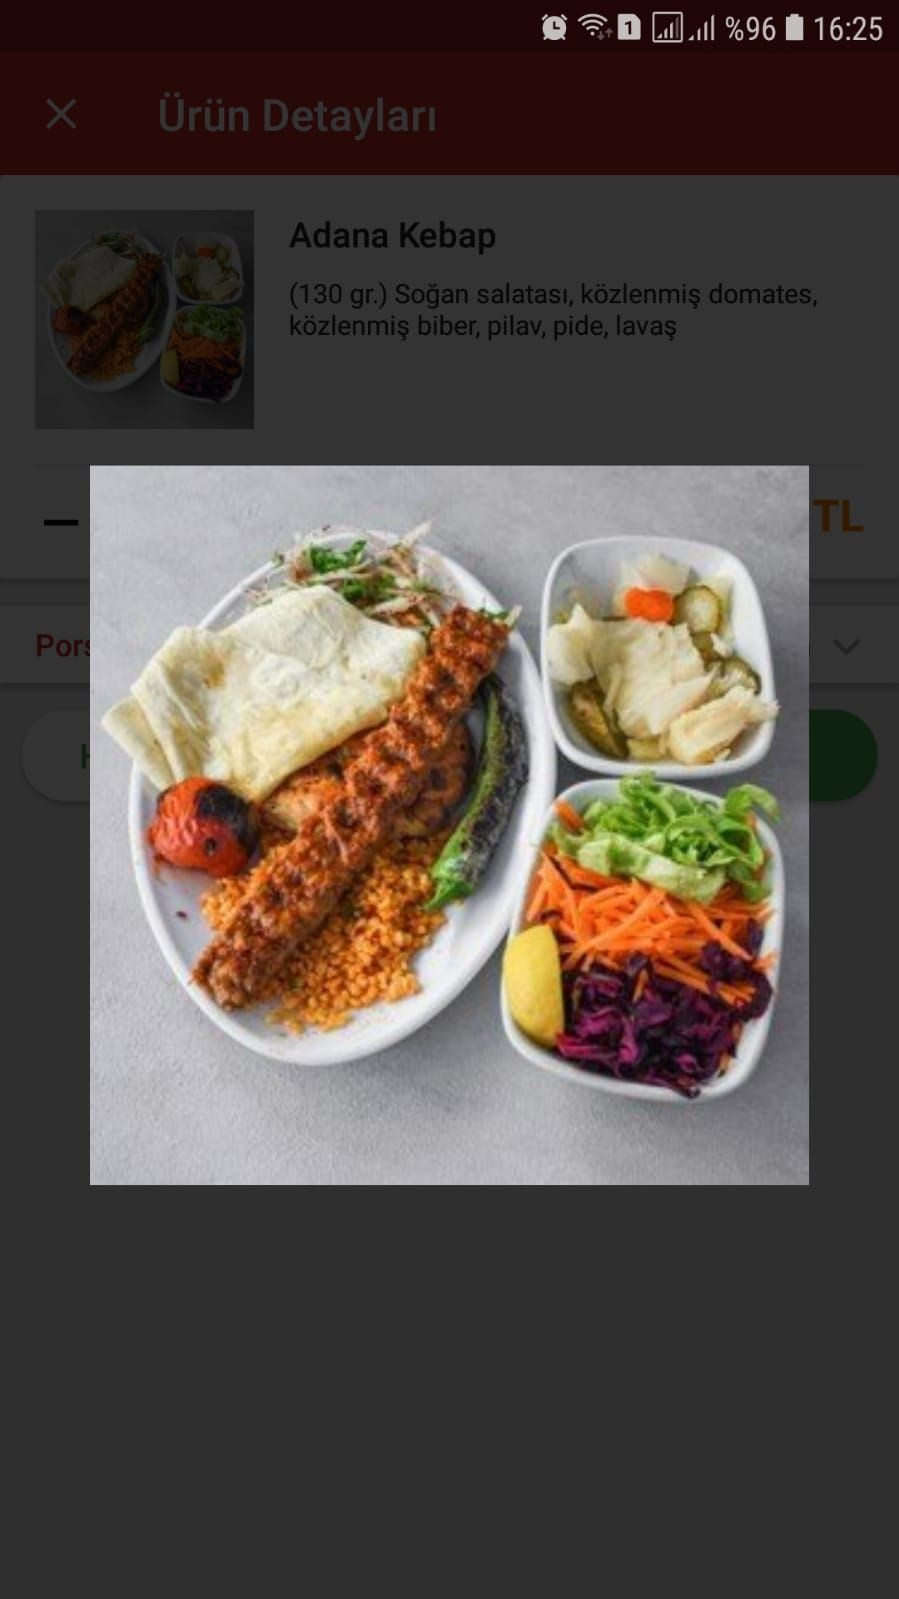 Uludağ Kebap Adana Kebap + Salata